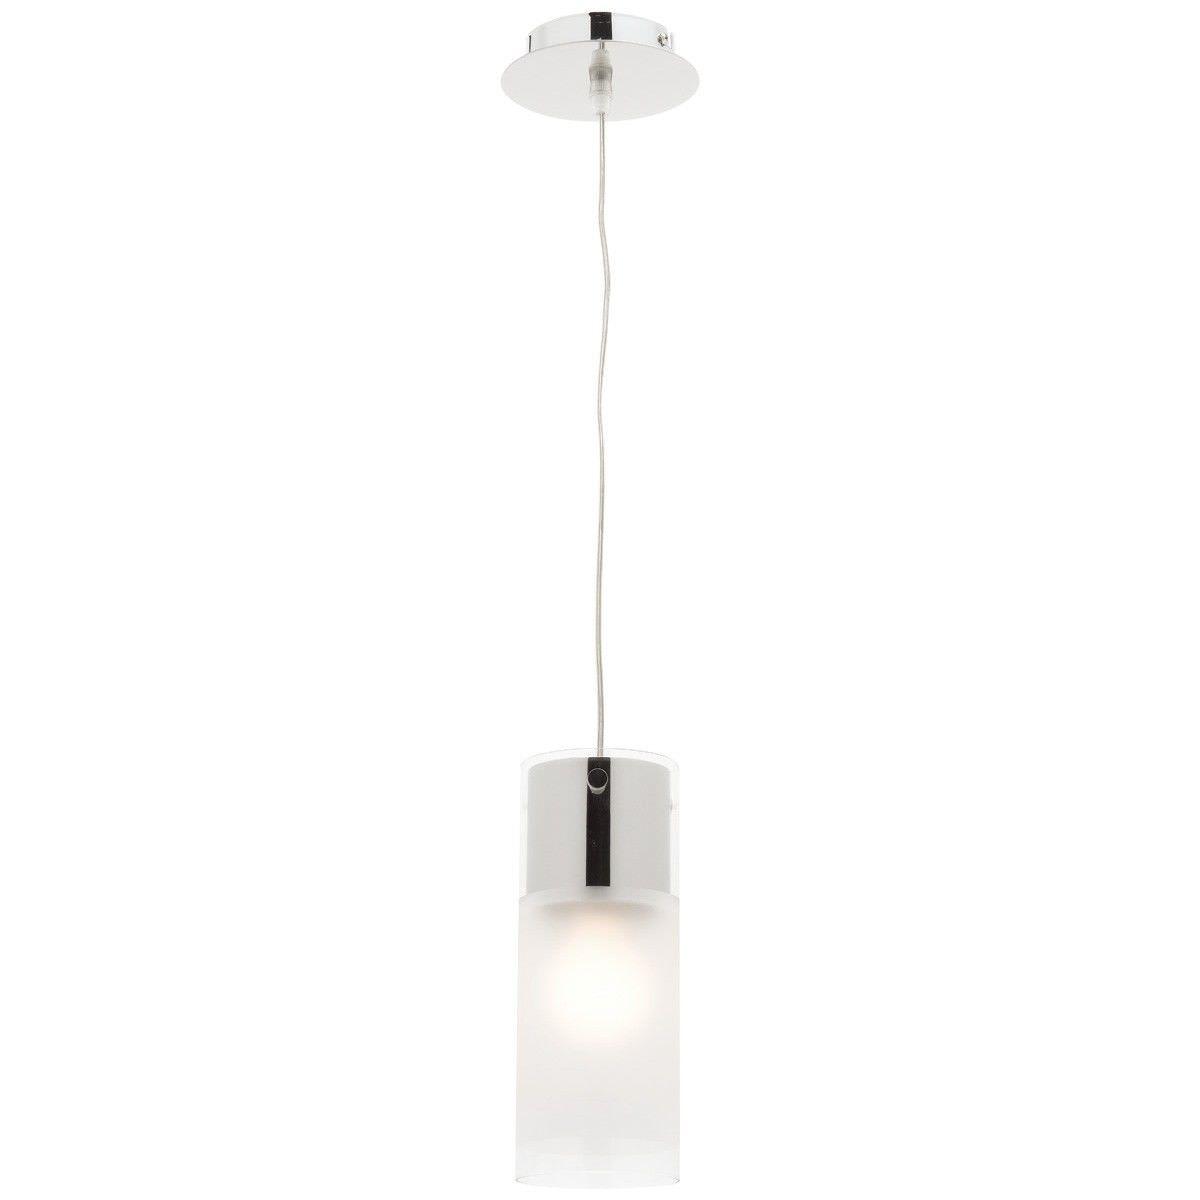 Infinity 1 Light Cord Drop